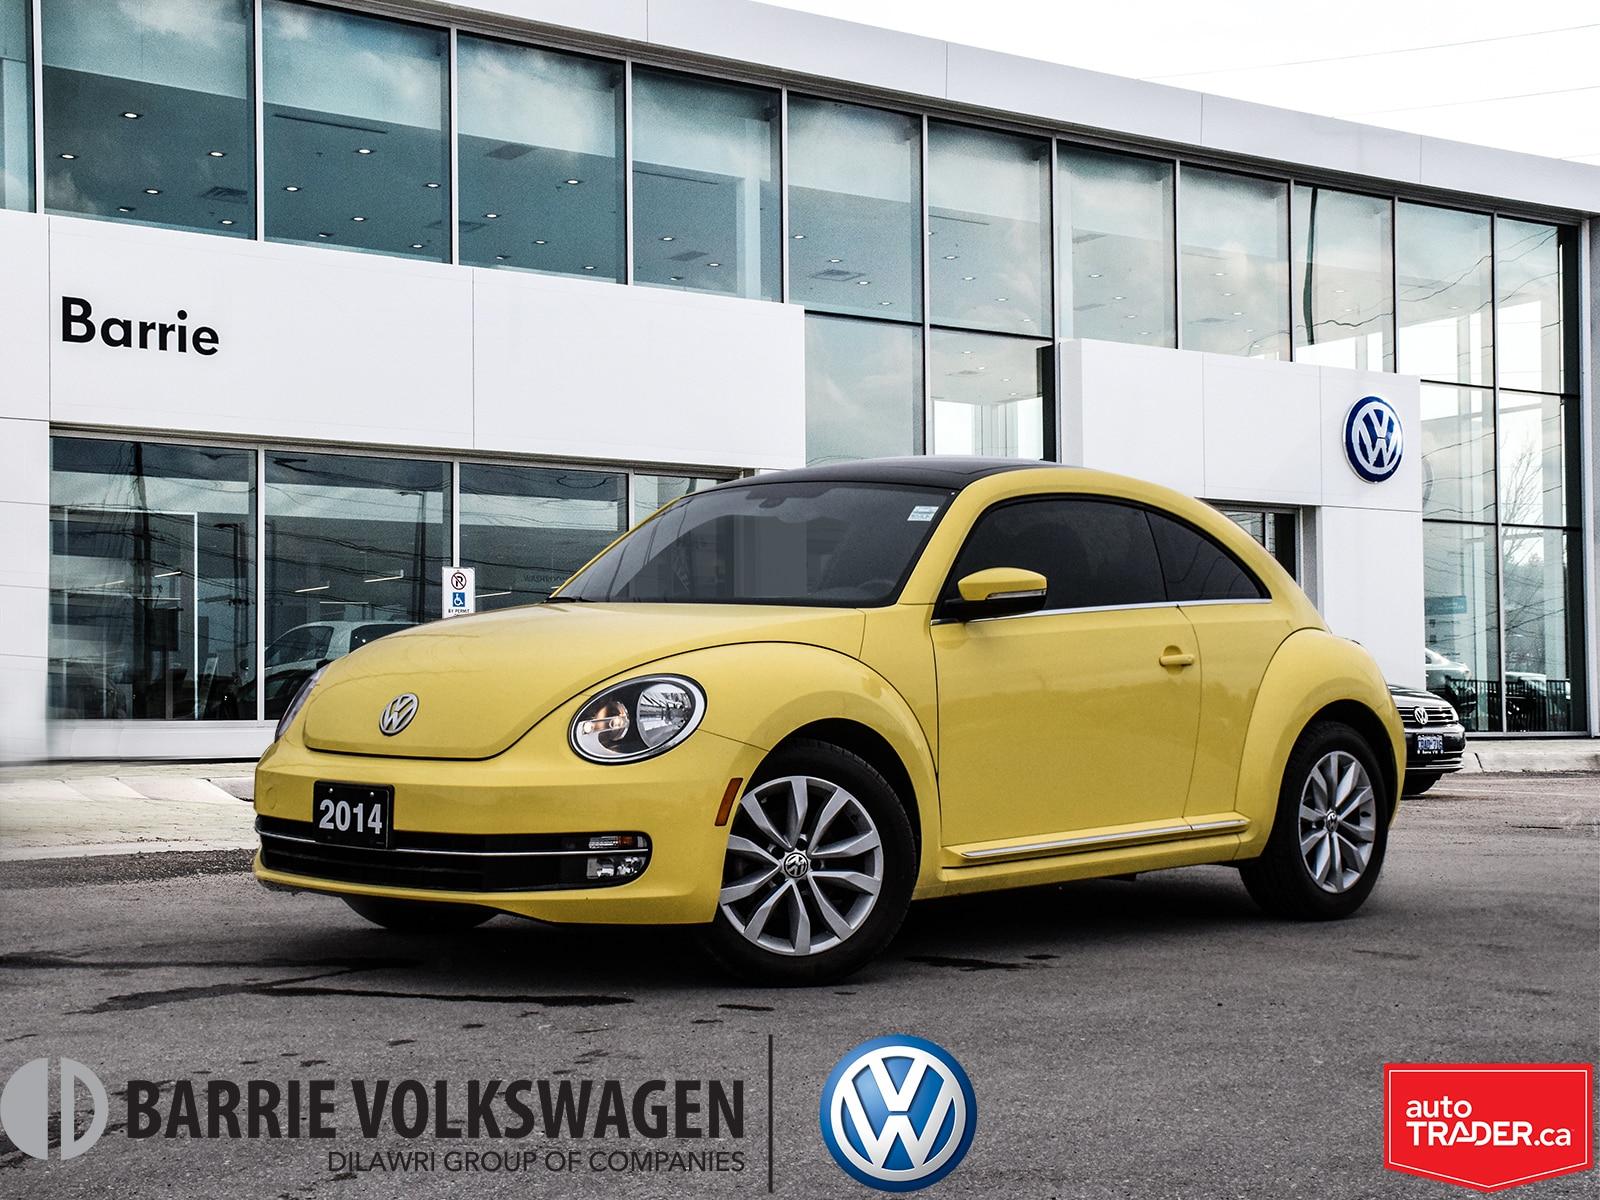 2014 Volkswagen Beetle Highline/0.90% FINANCE/Pano Sunroof/Heated Seats À hayon